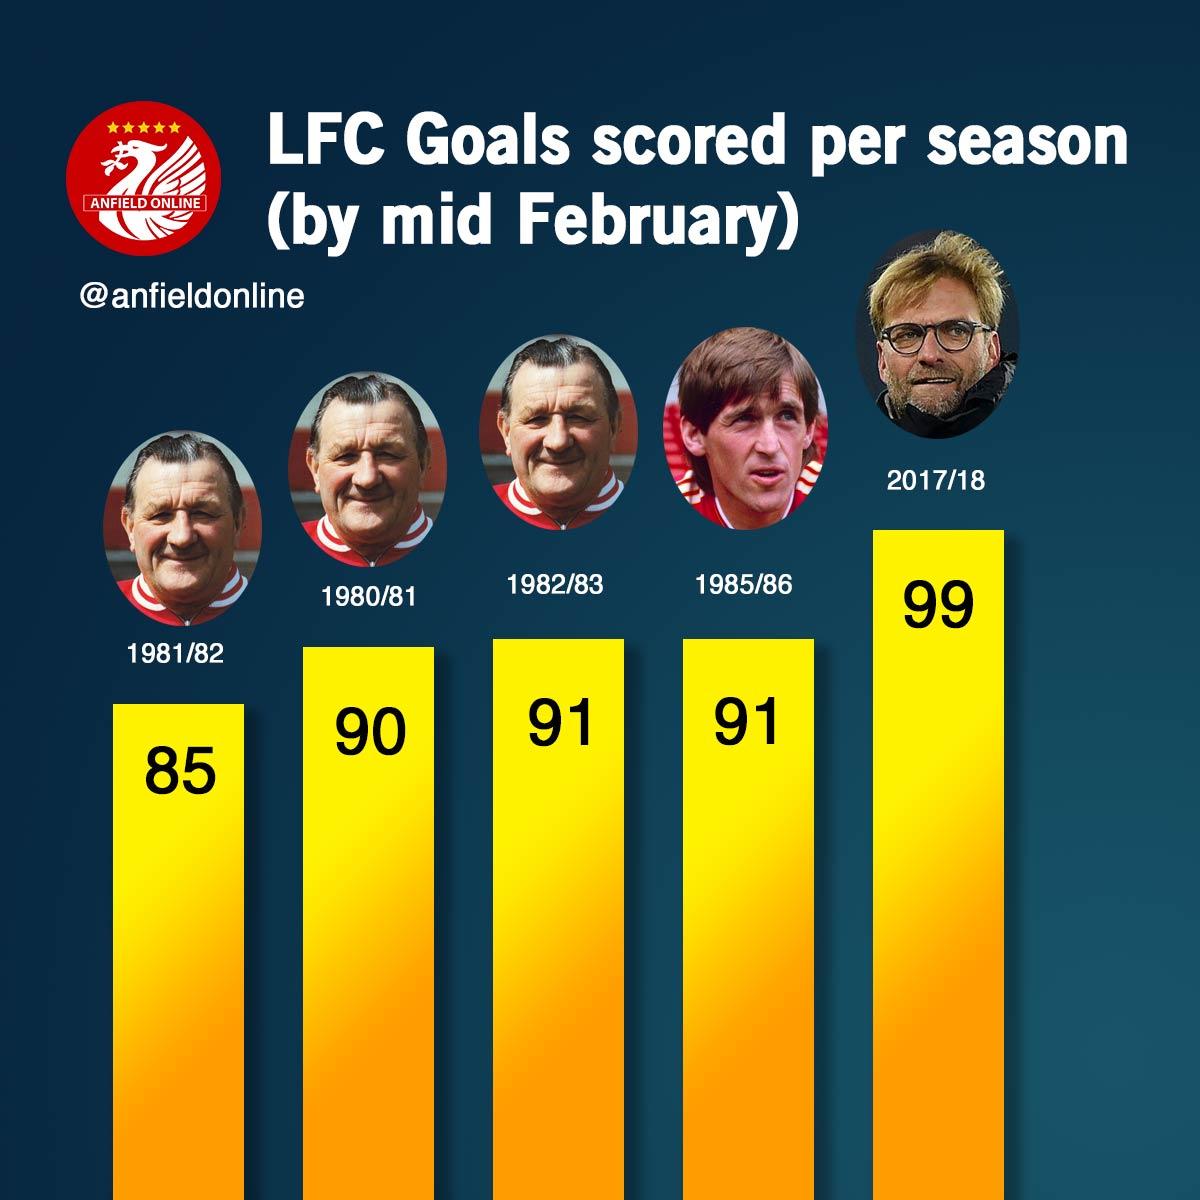 LFC reach 99 goals for the season